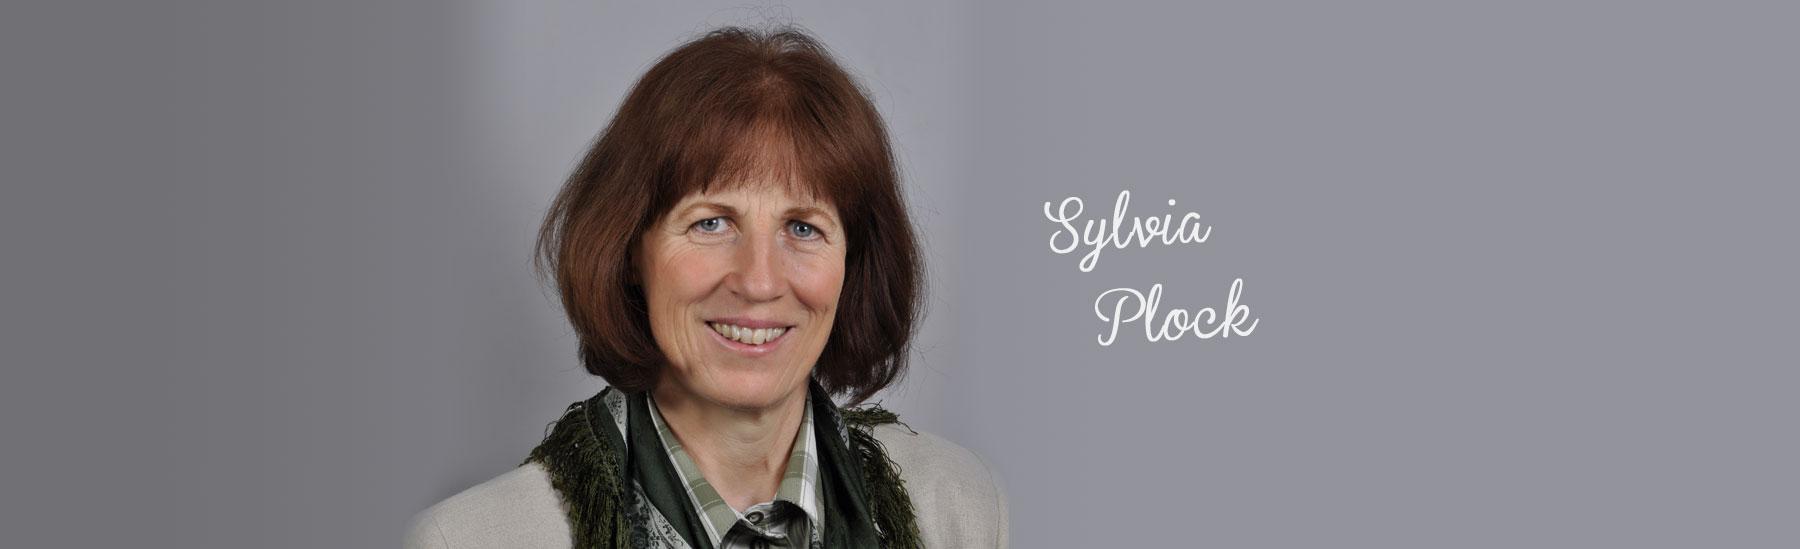 Sylvia Plock